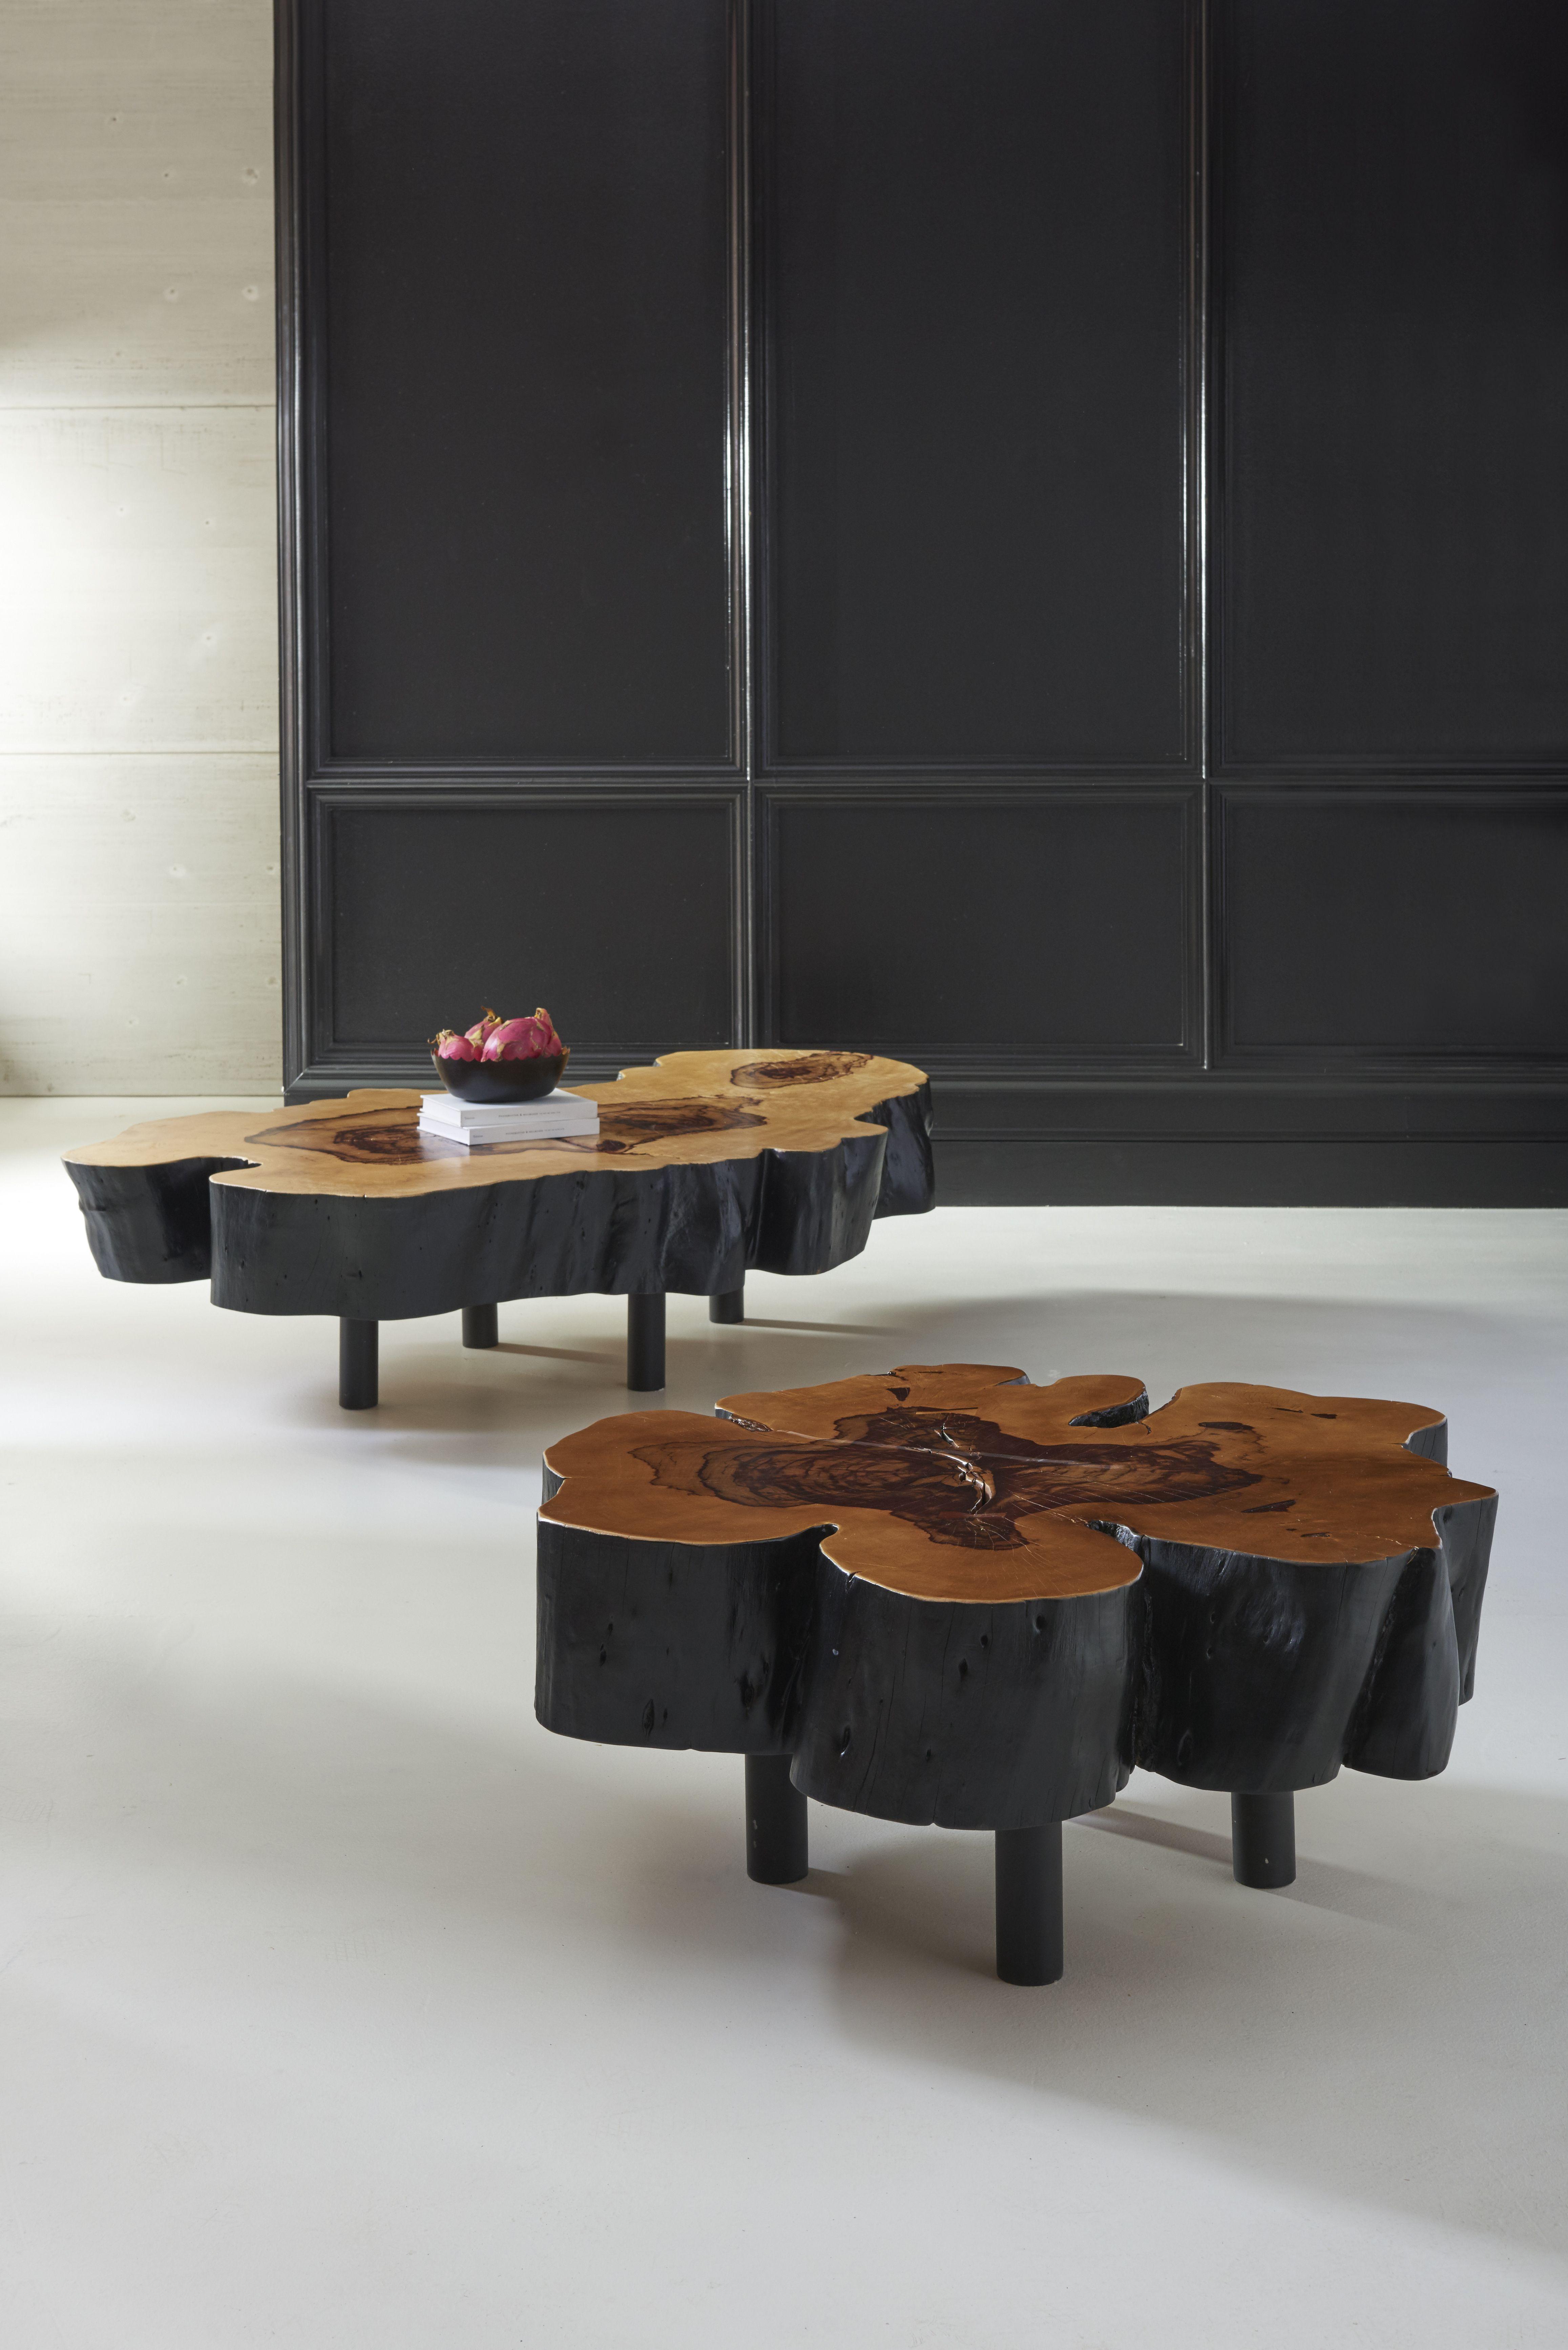 Tamarind Coffee Table With Burnt Edges Origins Coffee Wood Tamarind Burntedge Table Furniture Phillipsco Coffee Table Table Wood [ 6936 x 4629 Pixel ]